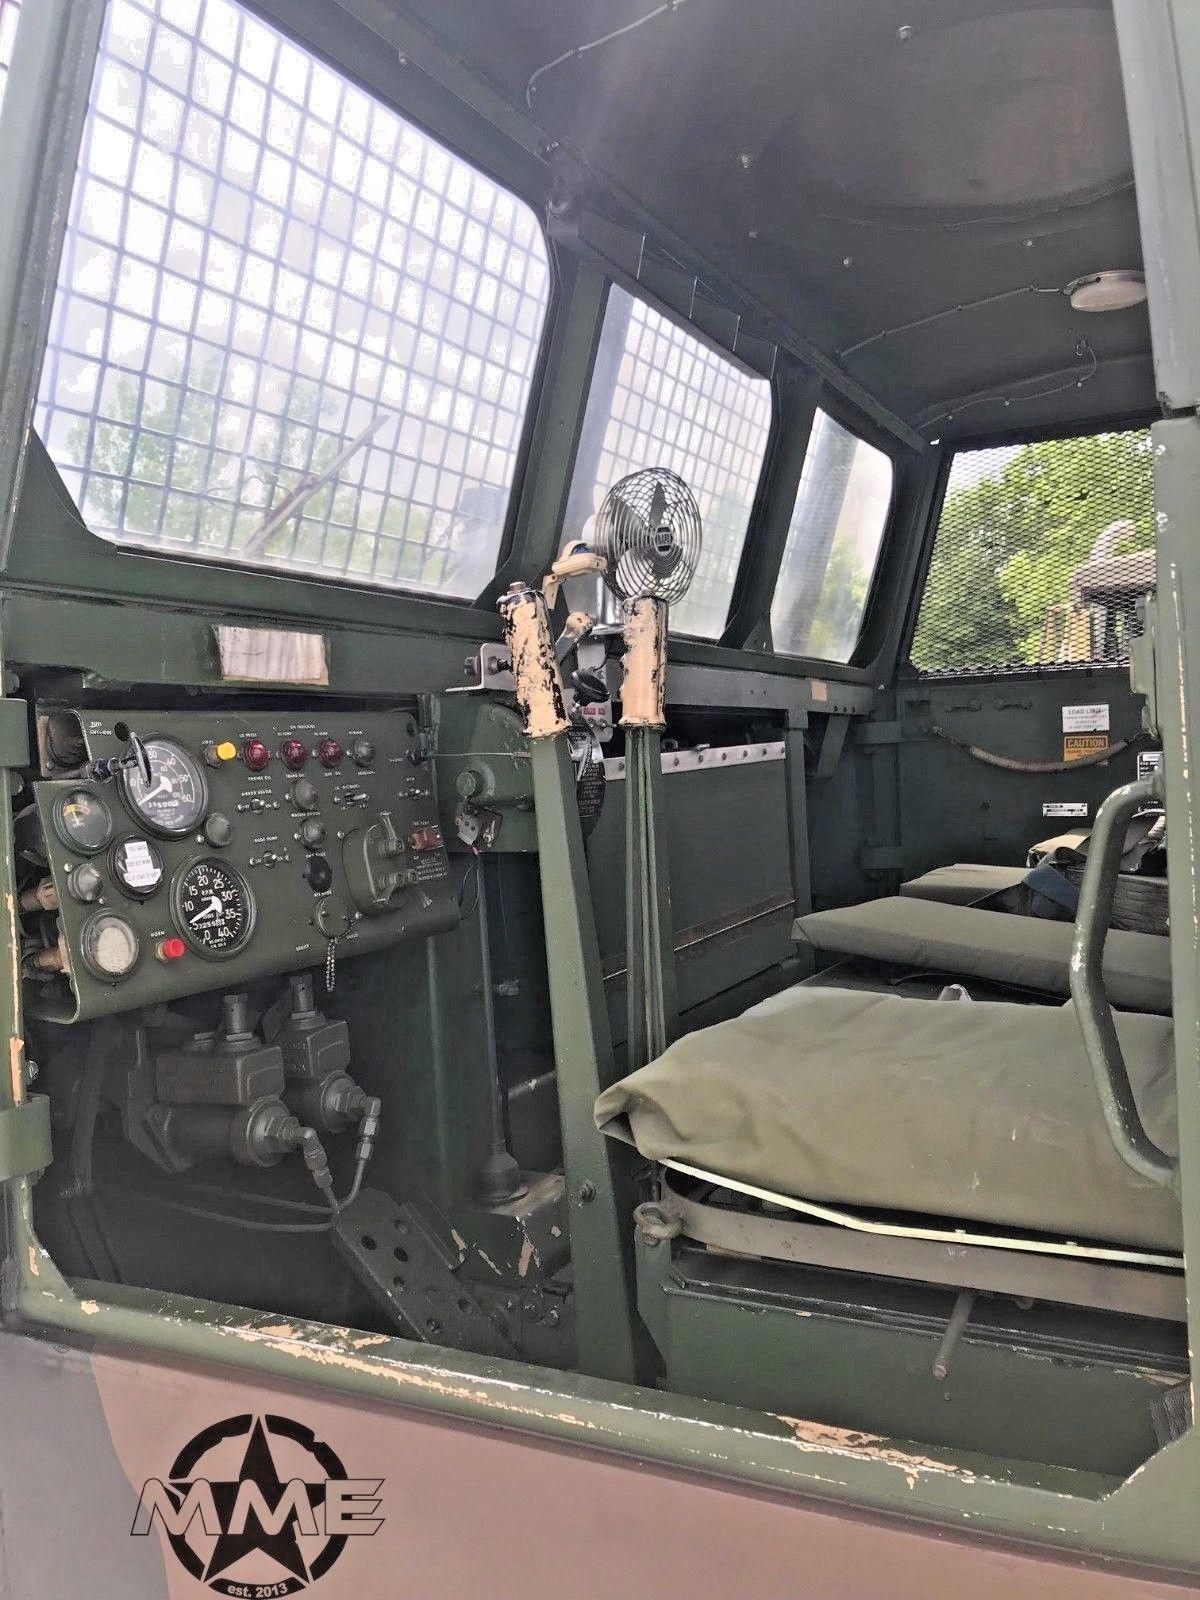 Amphibious Vehicle For Sale >> BangShift.com This M548A1 Tracked Amphibious Vehicle ...